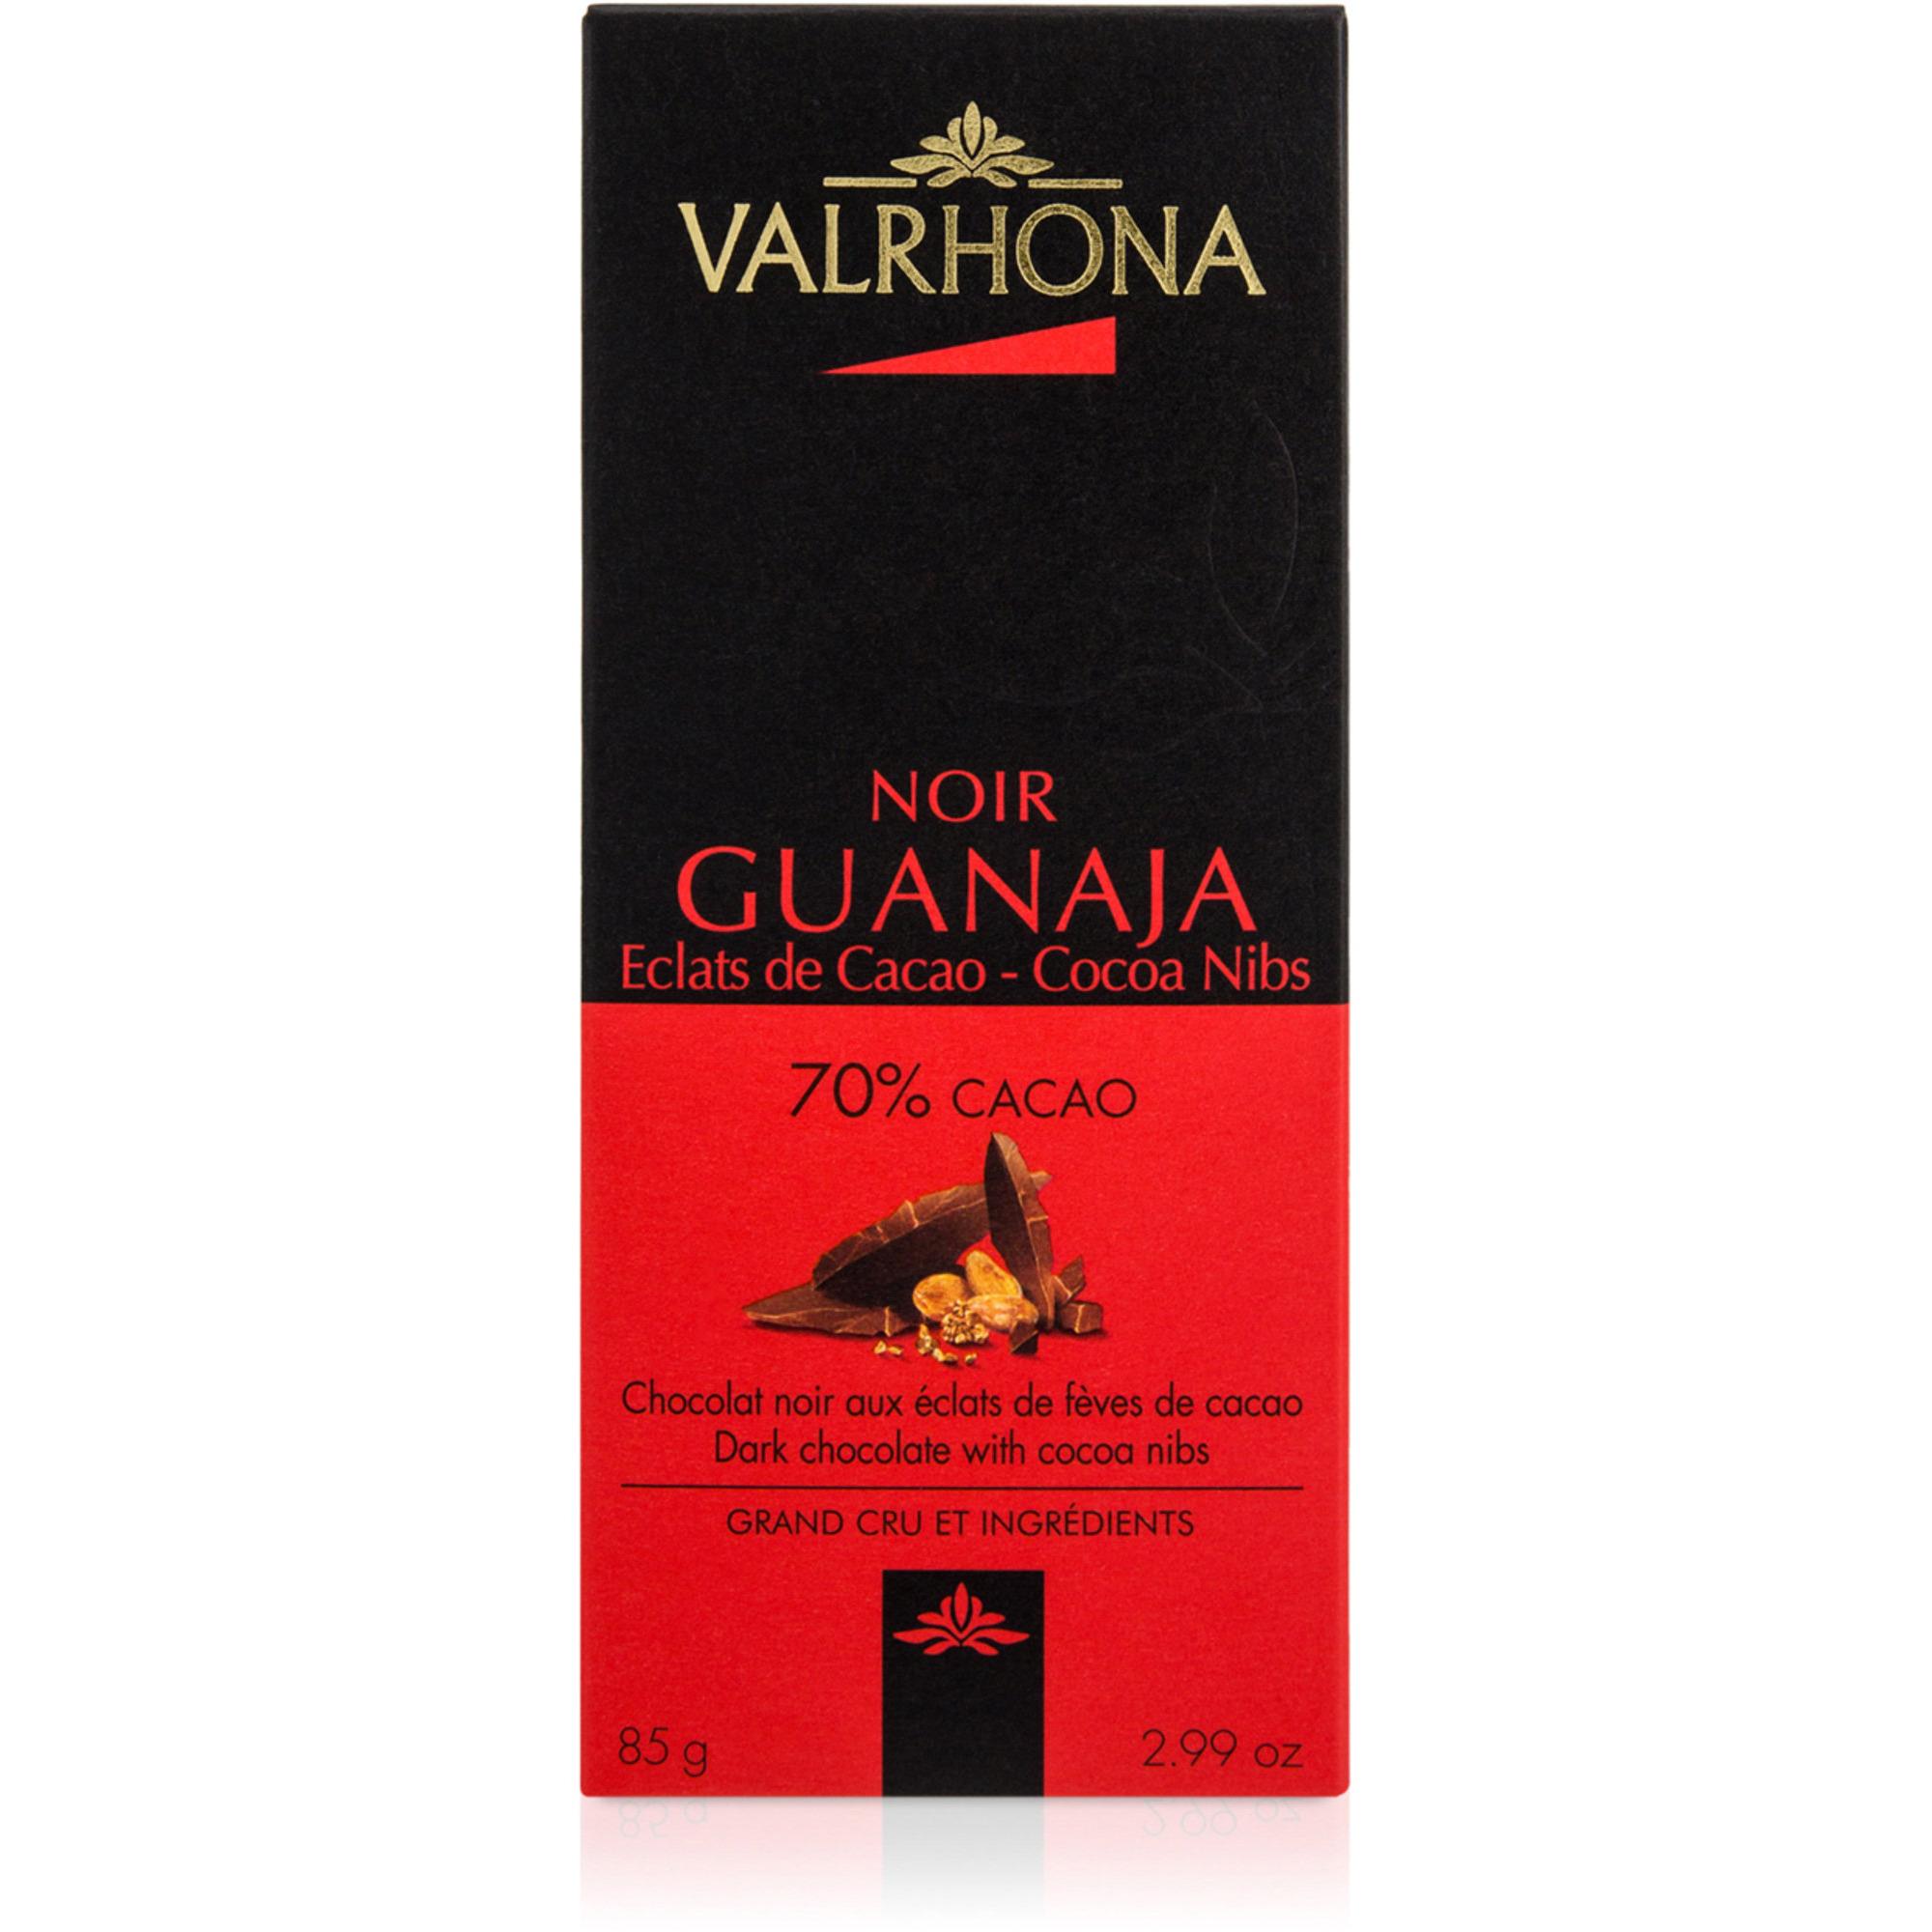 Valrhona Guanaja Cocoa 70% 85g